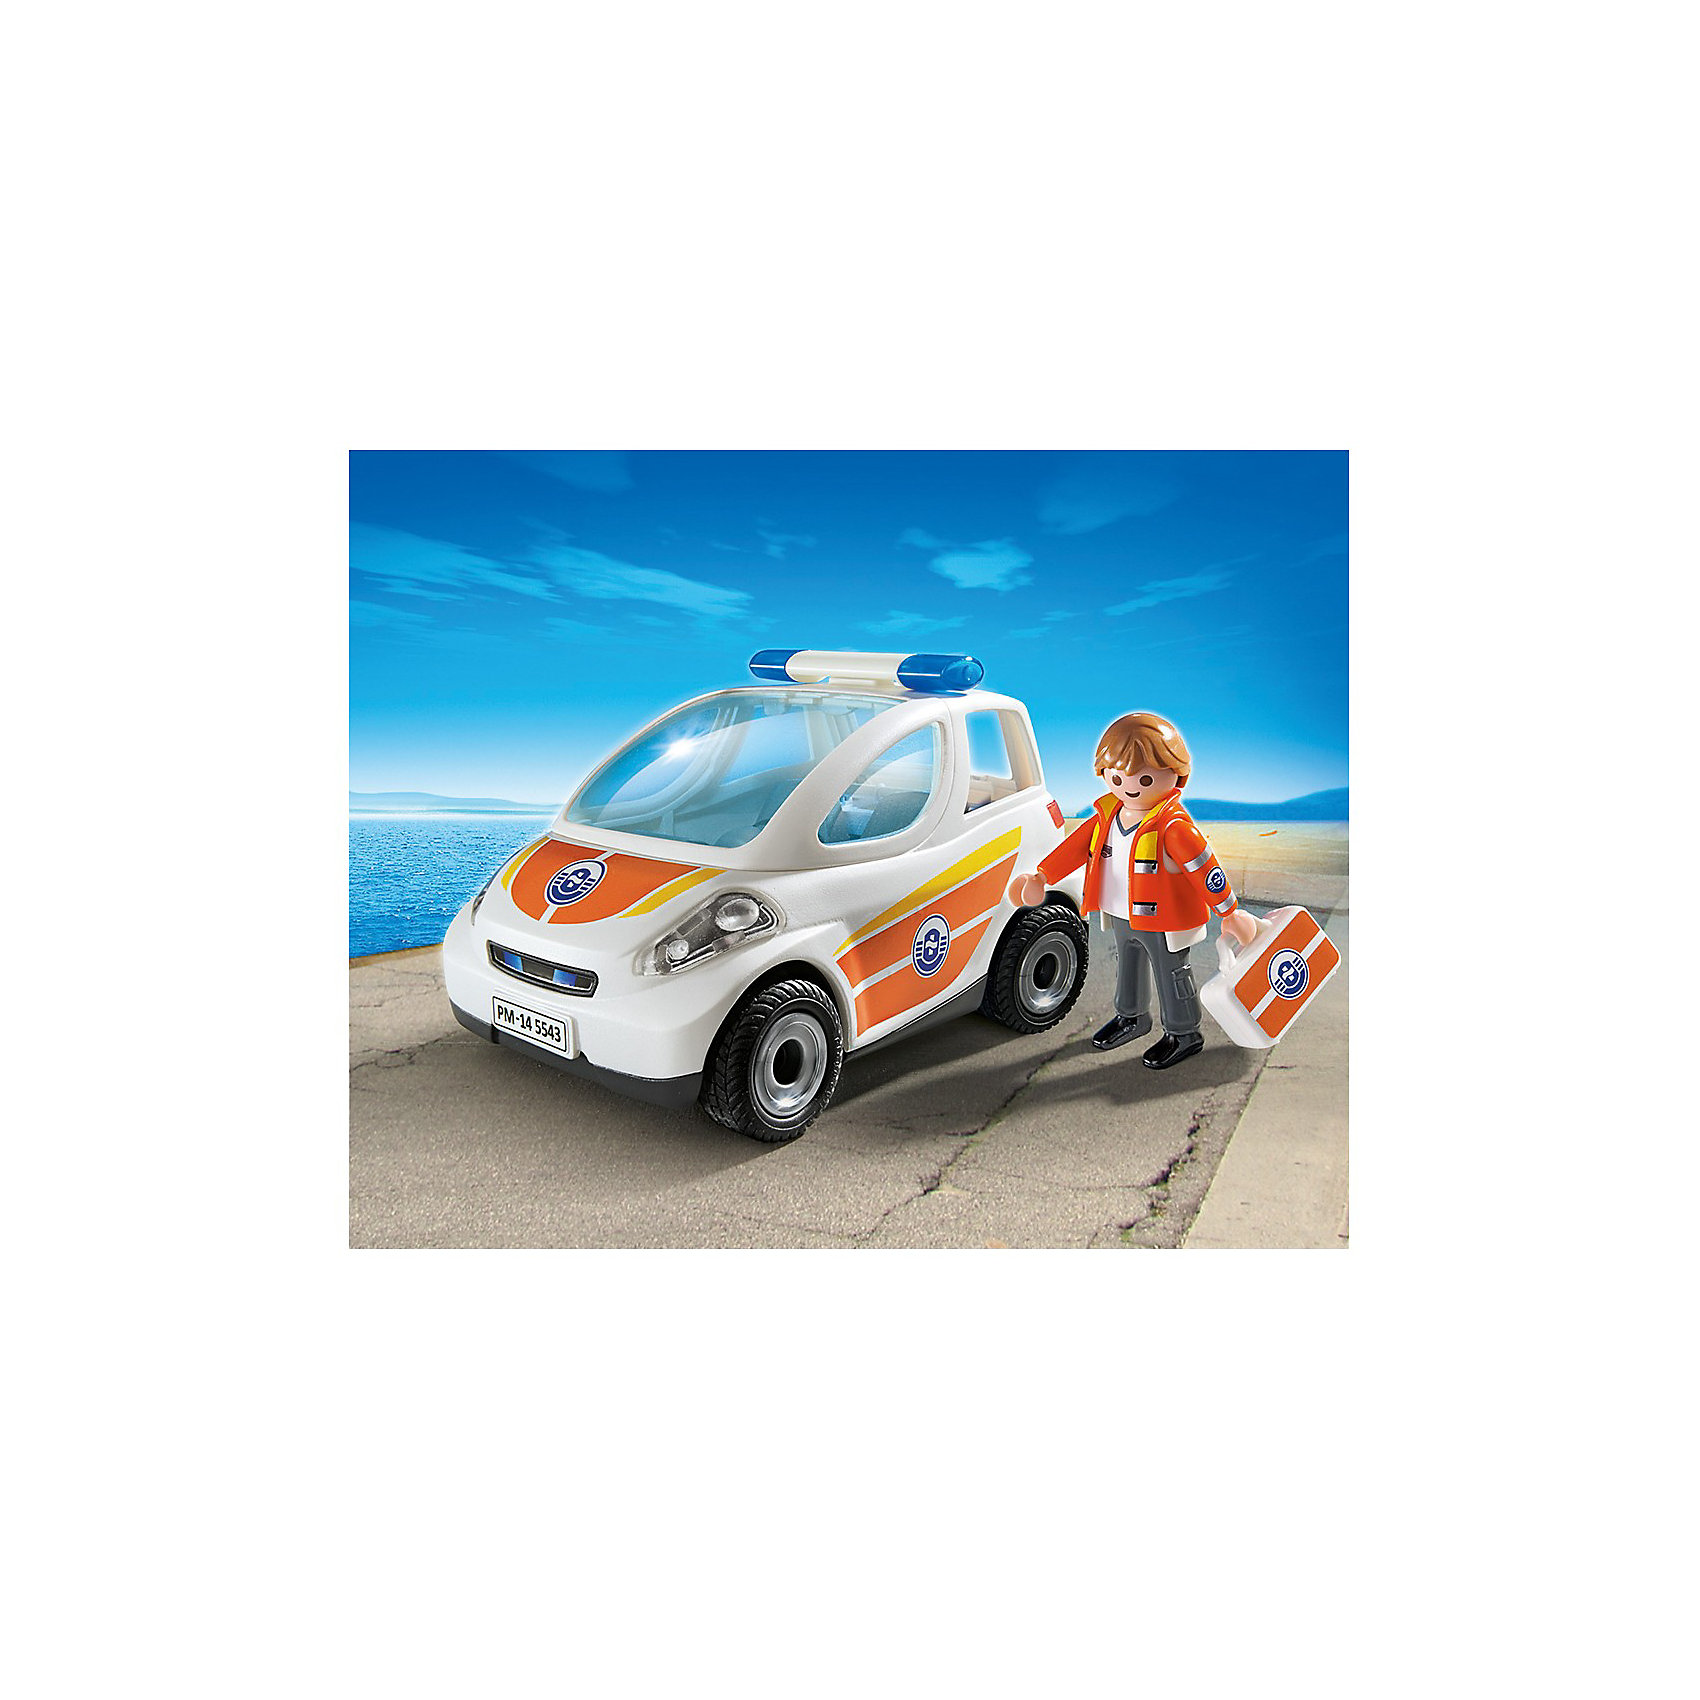 PLAYMOBIL® PLAYMOBIL 5543 Береговая охрана: Машина первой помощи playmobil спасатели с носилками